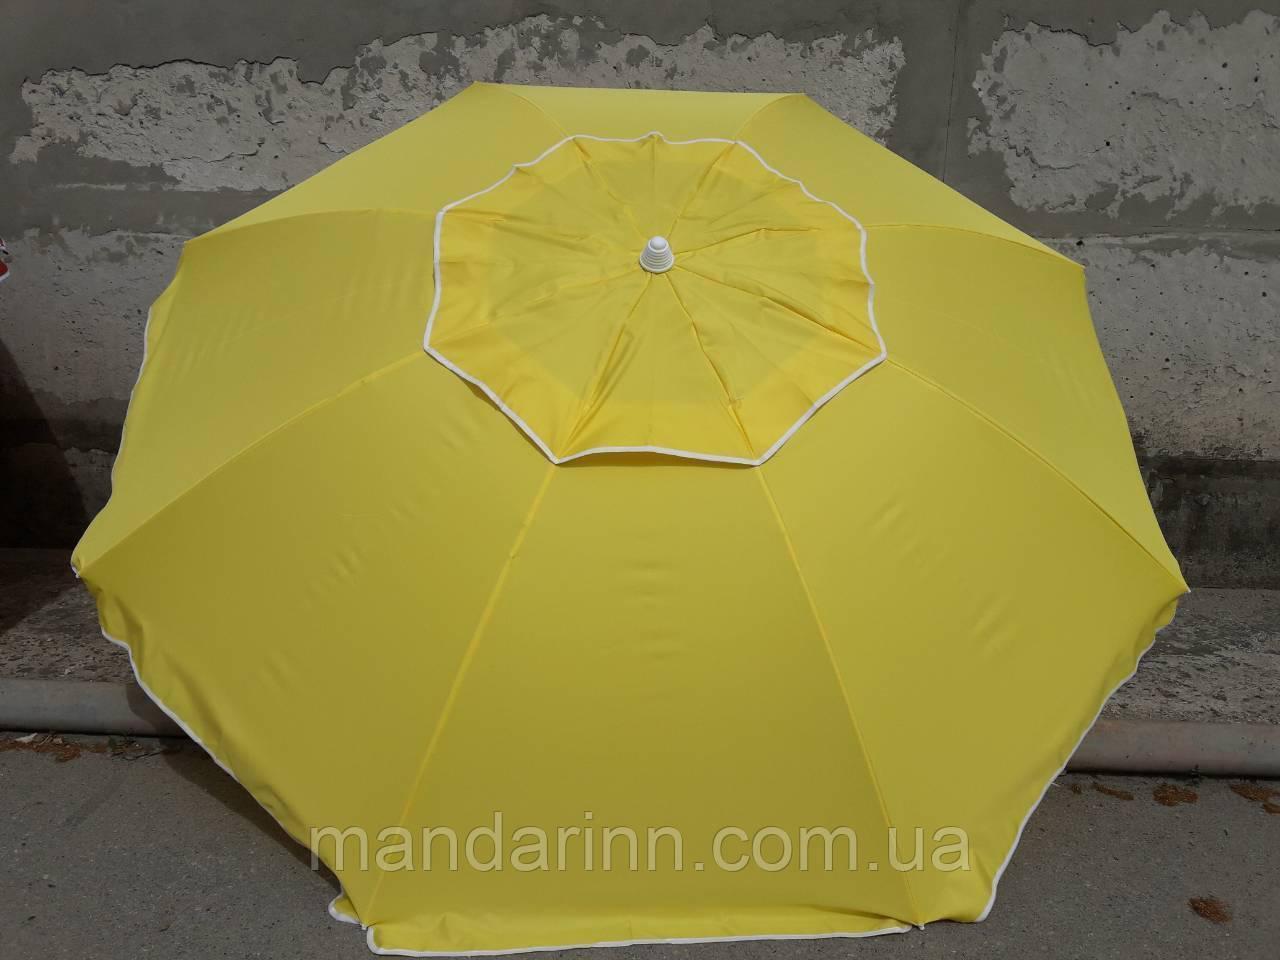 Пляжний зонт 1,8 м клапан нахил чохол червоний - фото 4